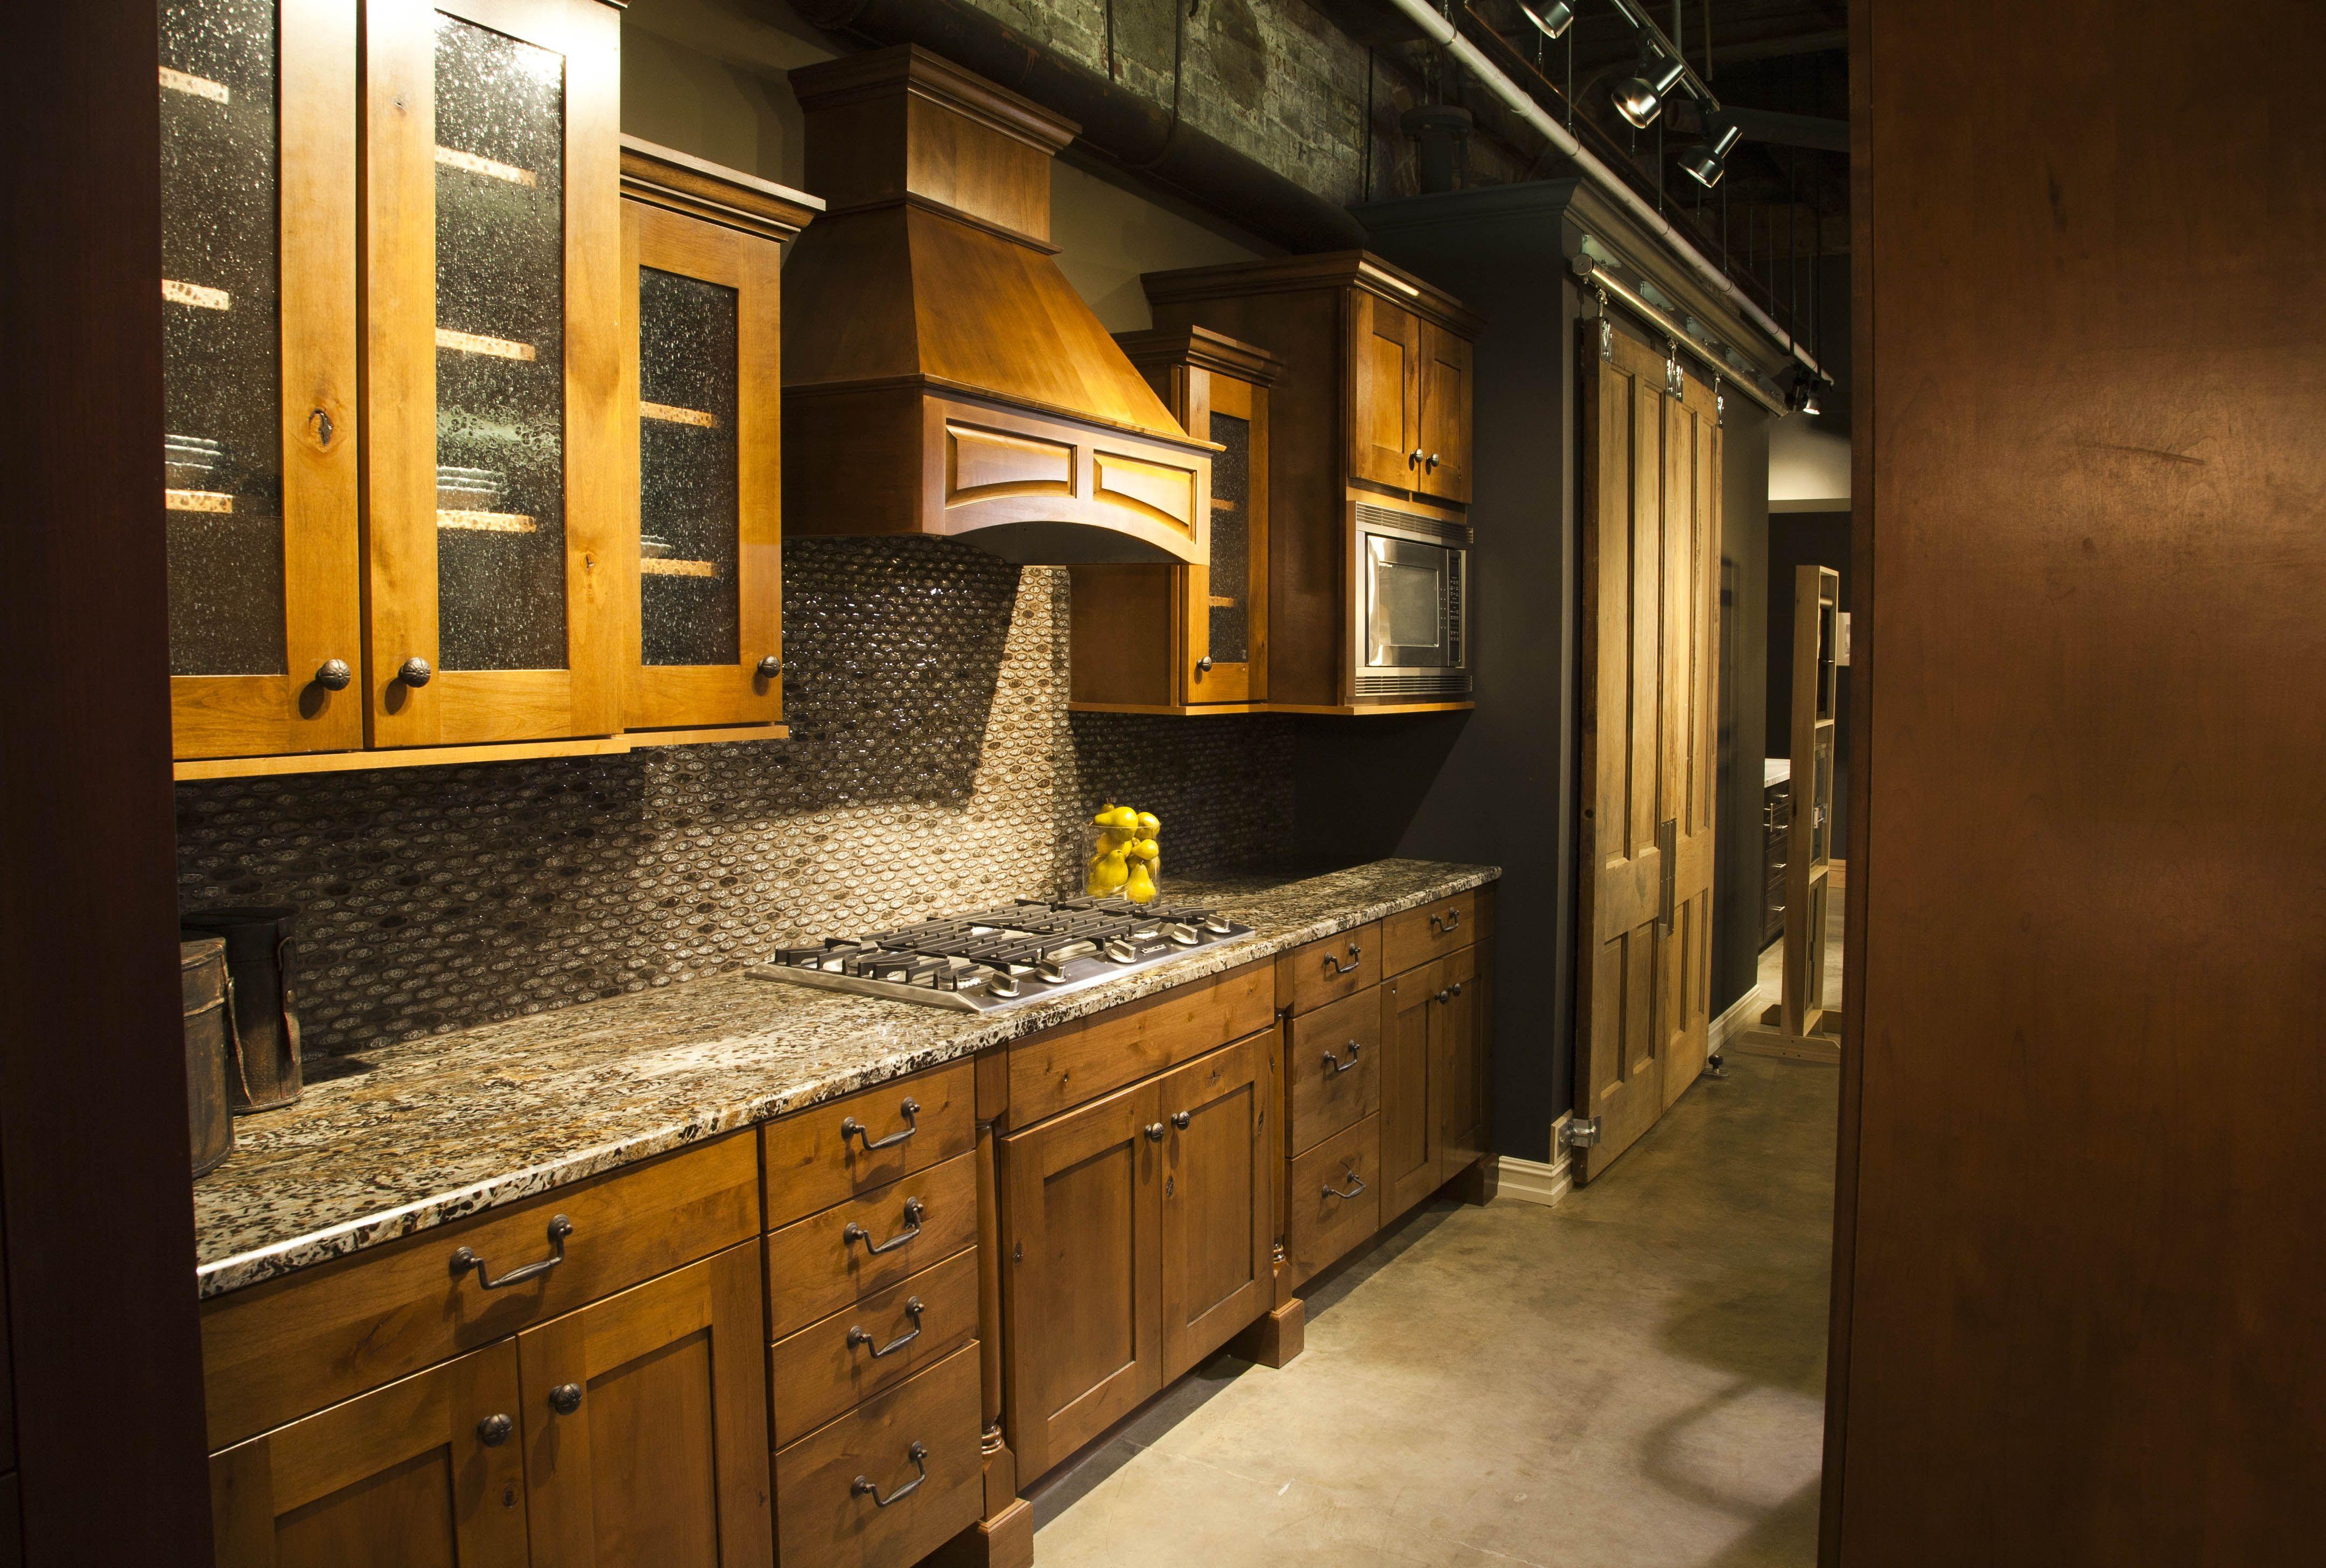 The Requarth Co Kitchen Showroom Dayton Ohio Home Depot Kitchen Remodel Cherry Wood Kitchen Cabinets Kitchen Remodel